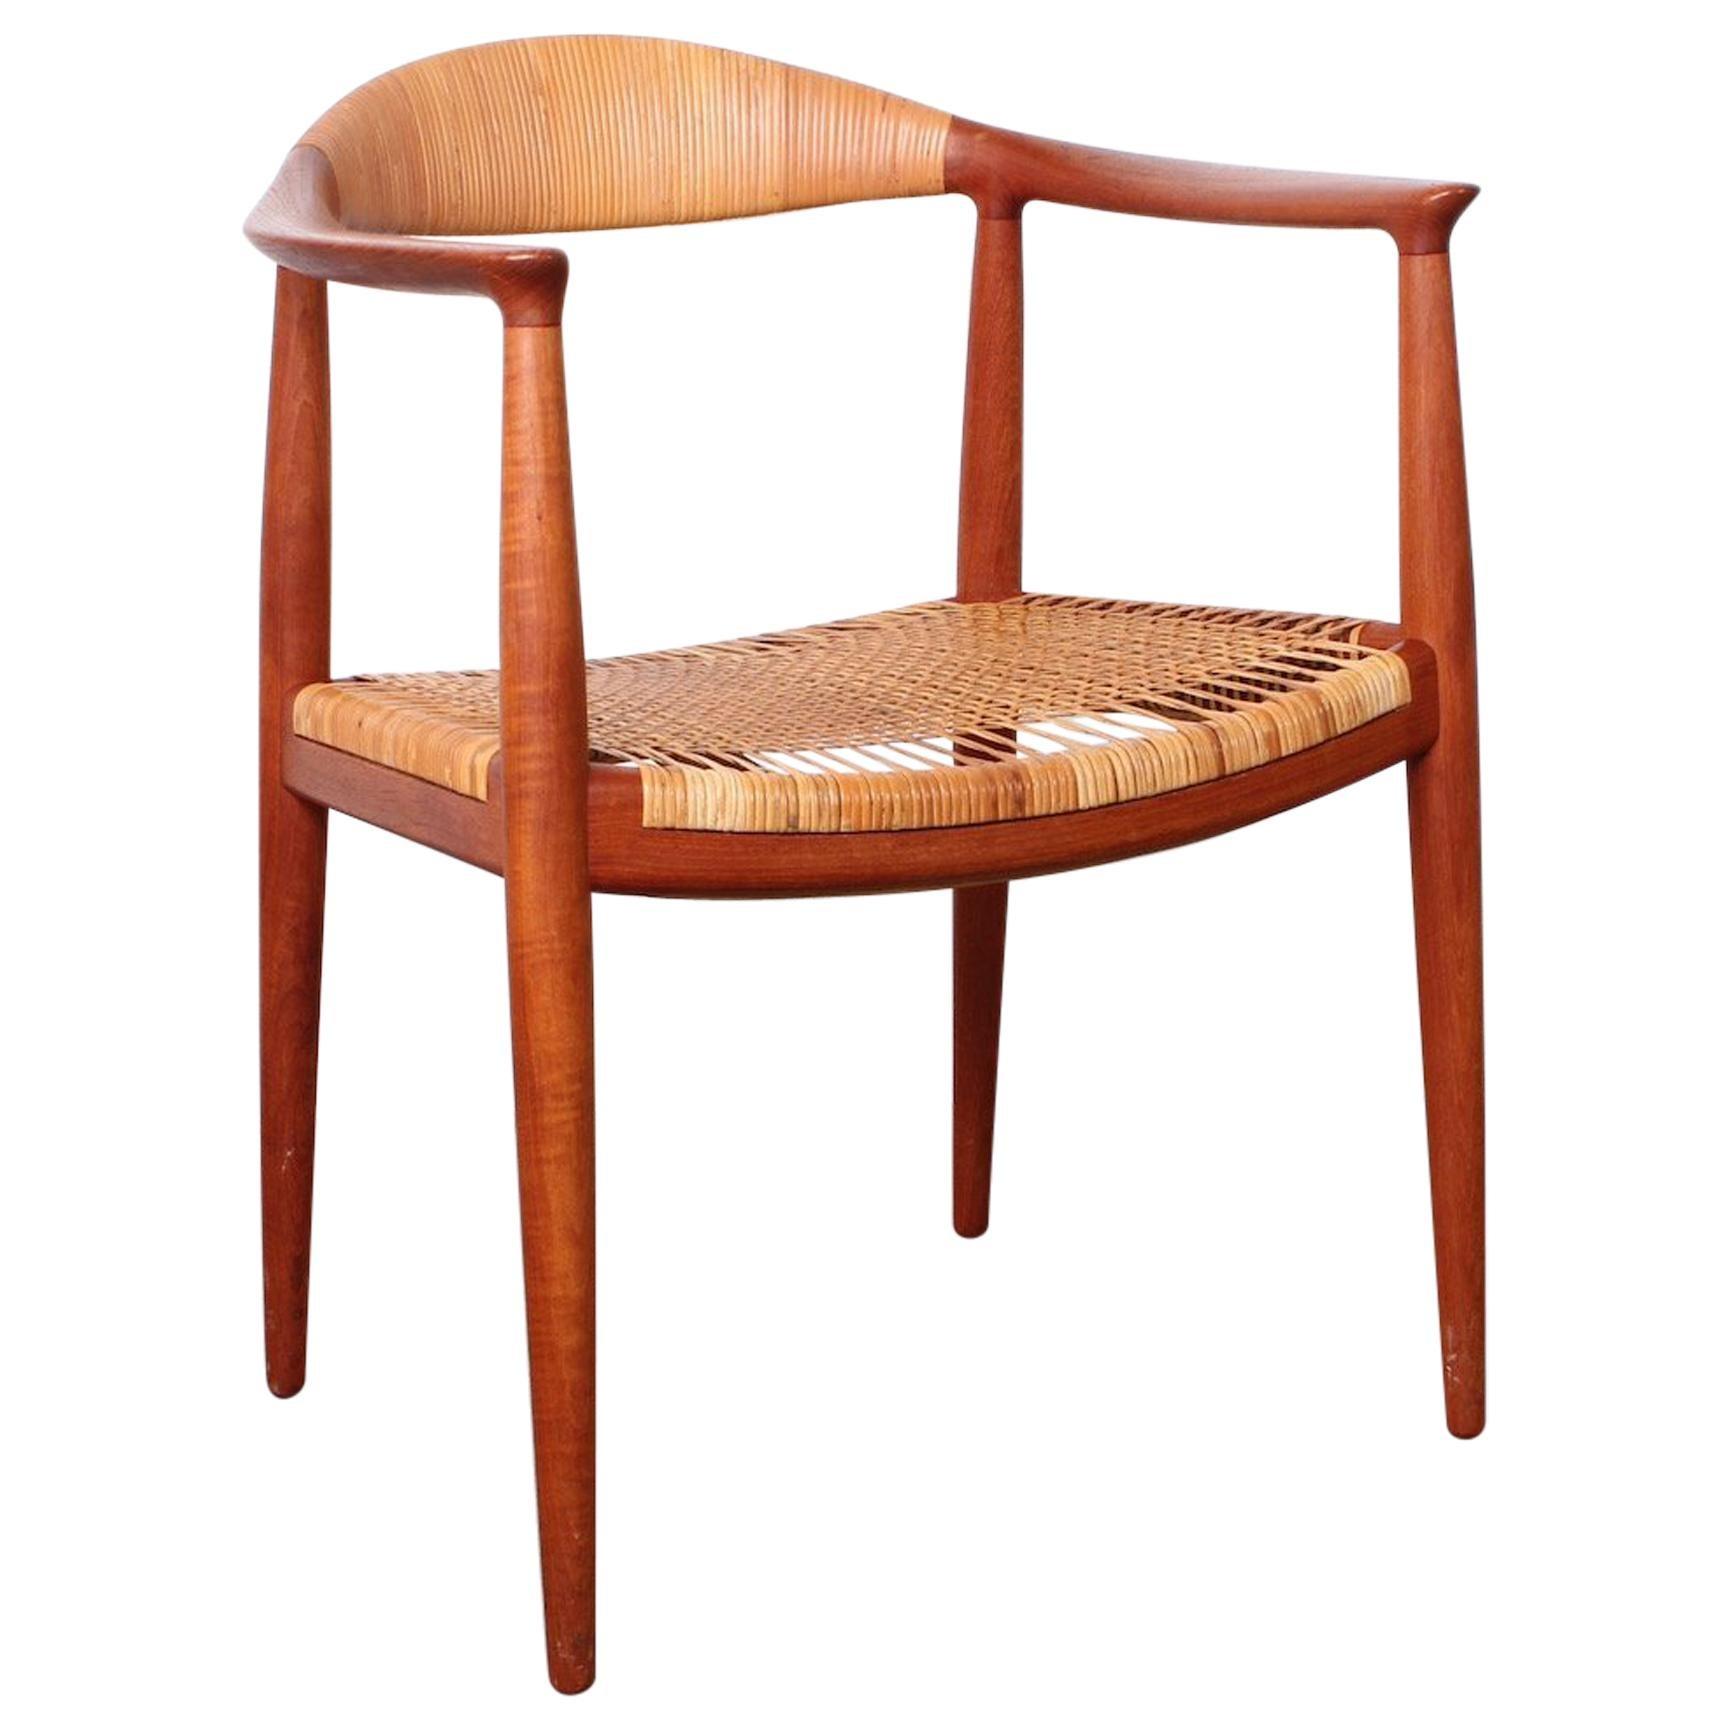 Early Original Round Chair by Hans Wegner